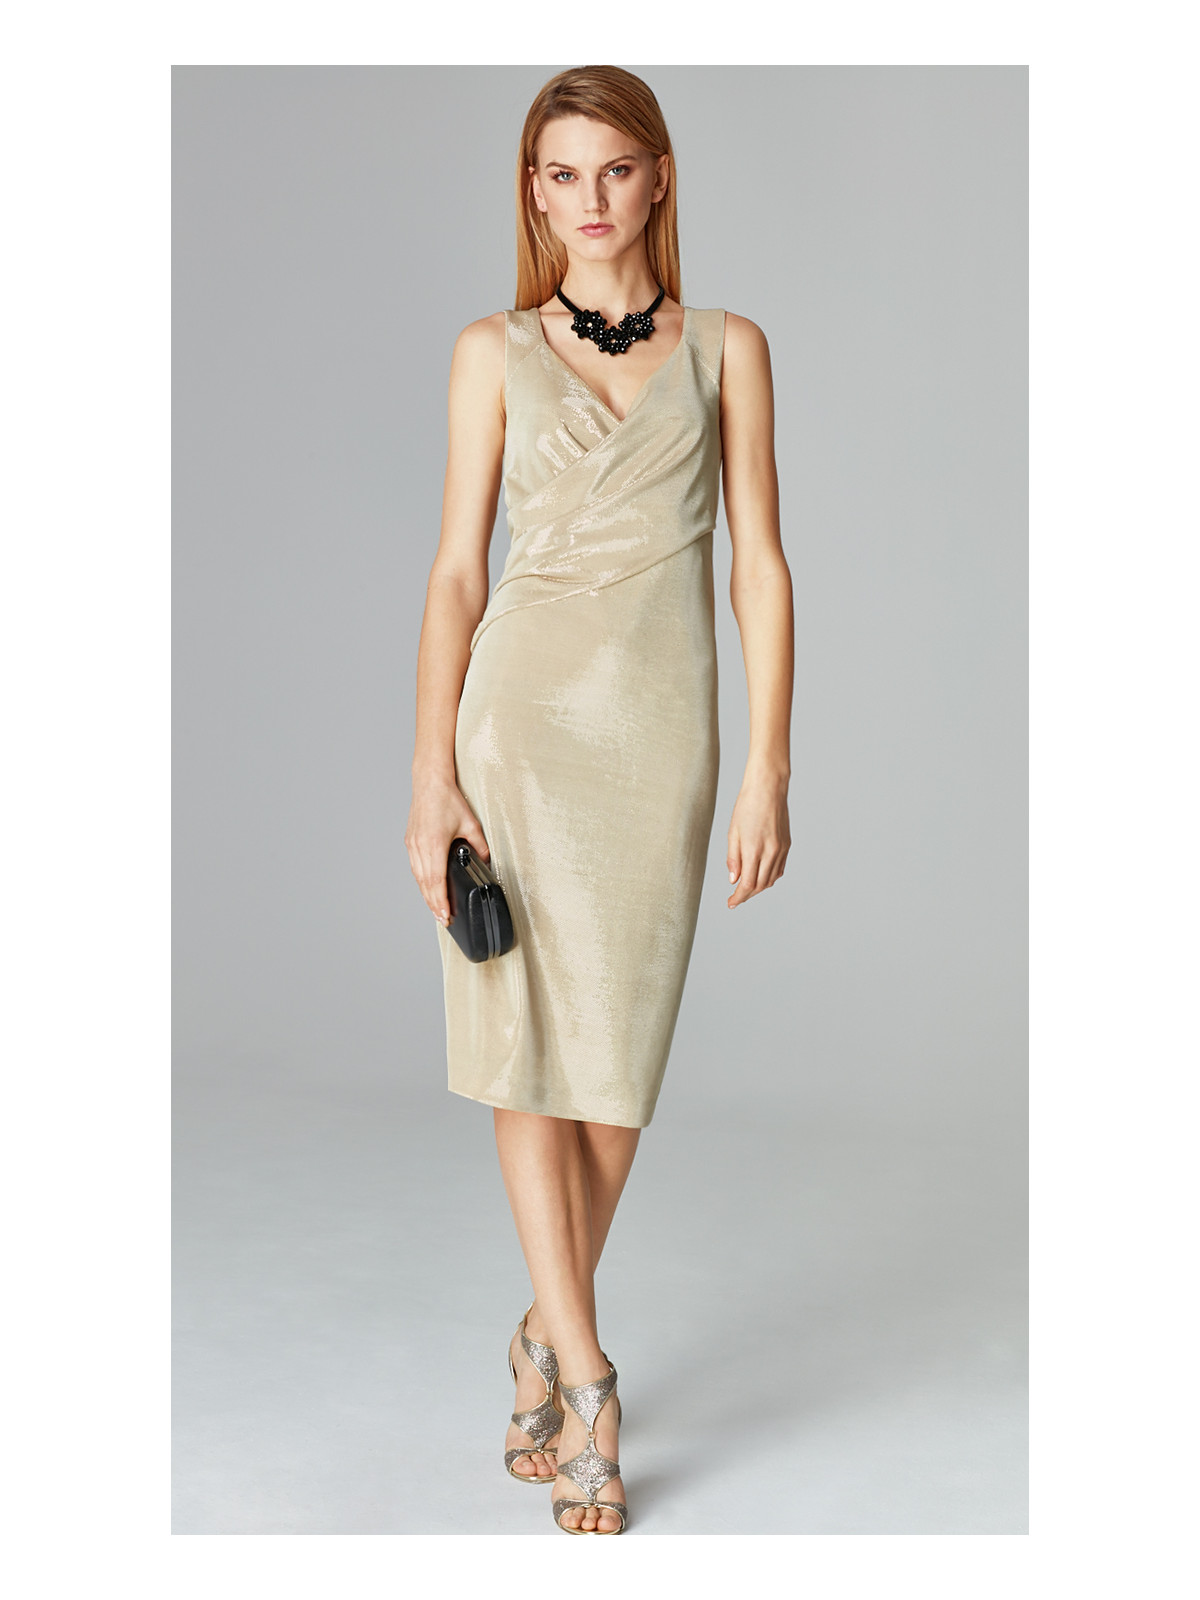 99a036d686 TARANKO sukienka roz 38 M - 7667582645 - oficjalne archiwum allegro